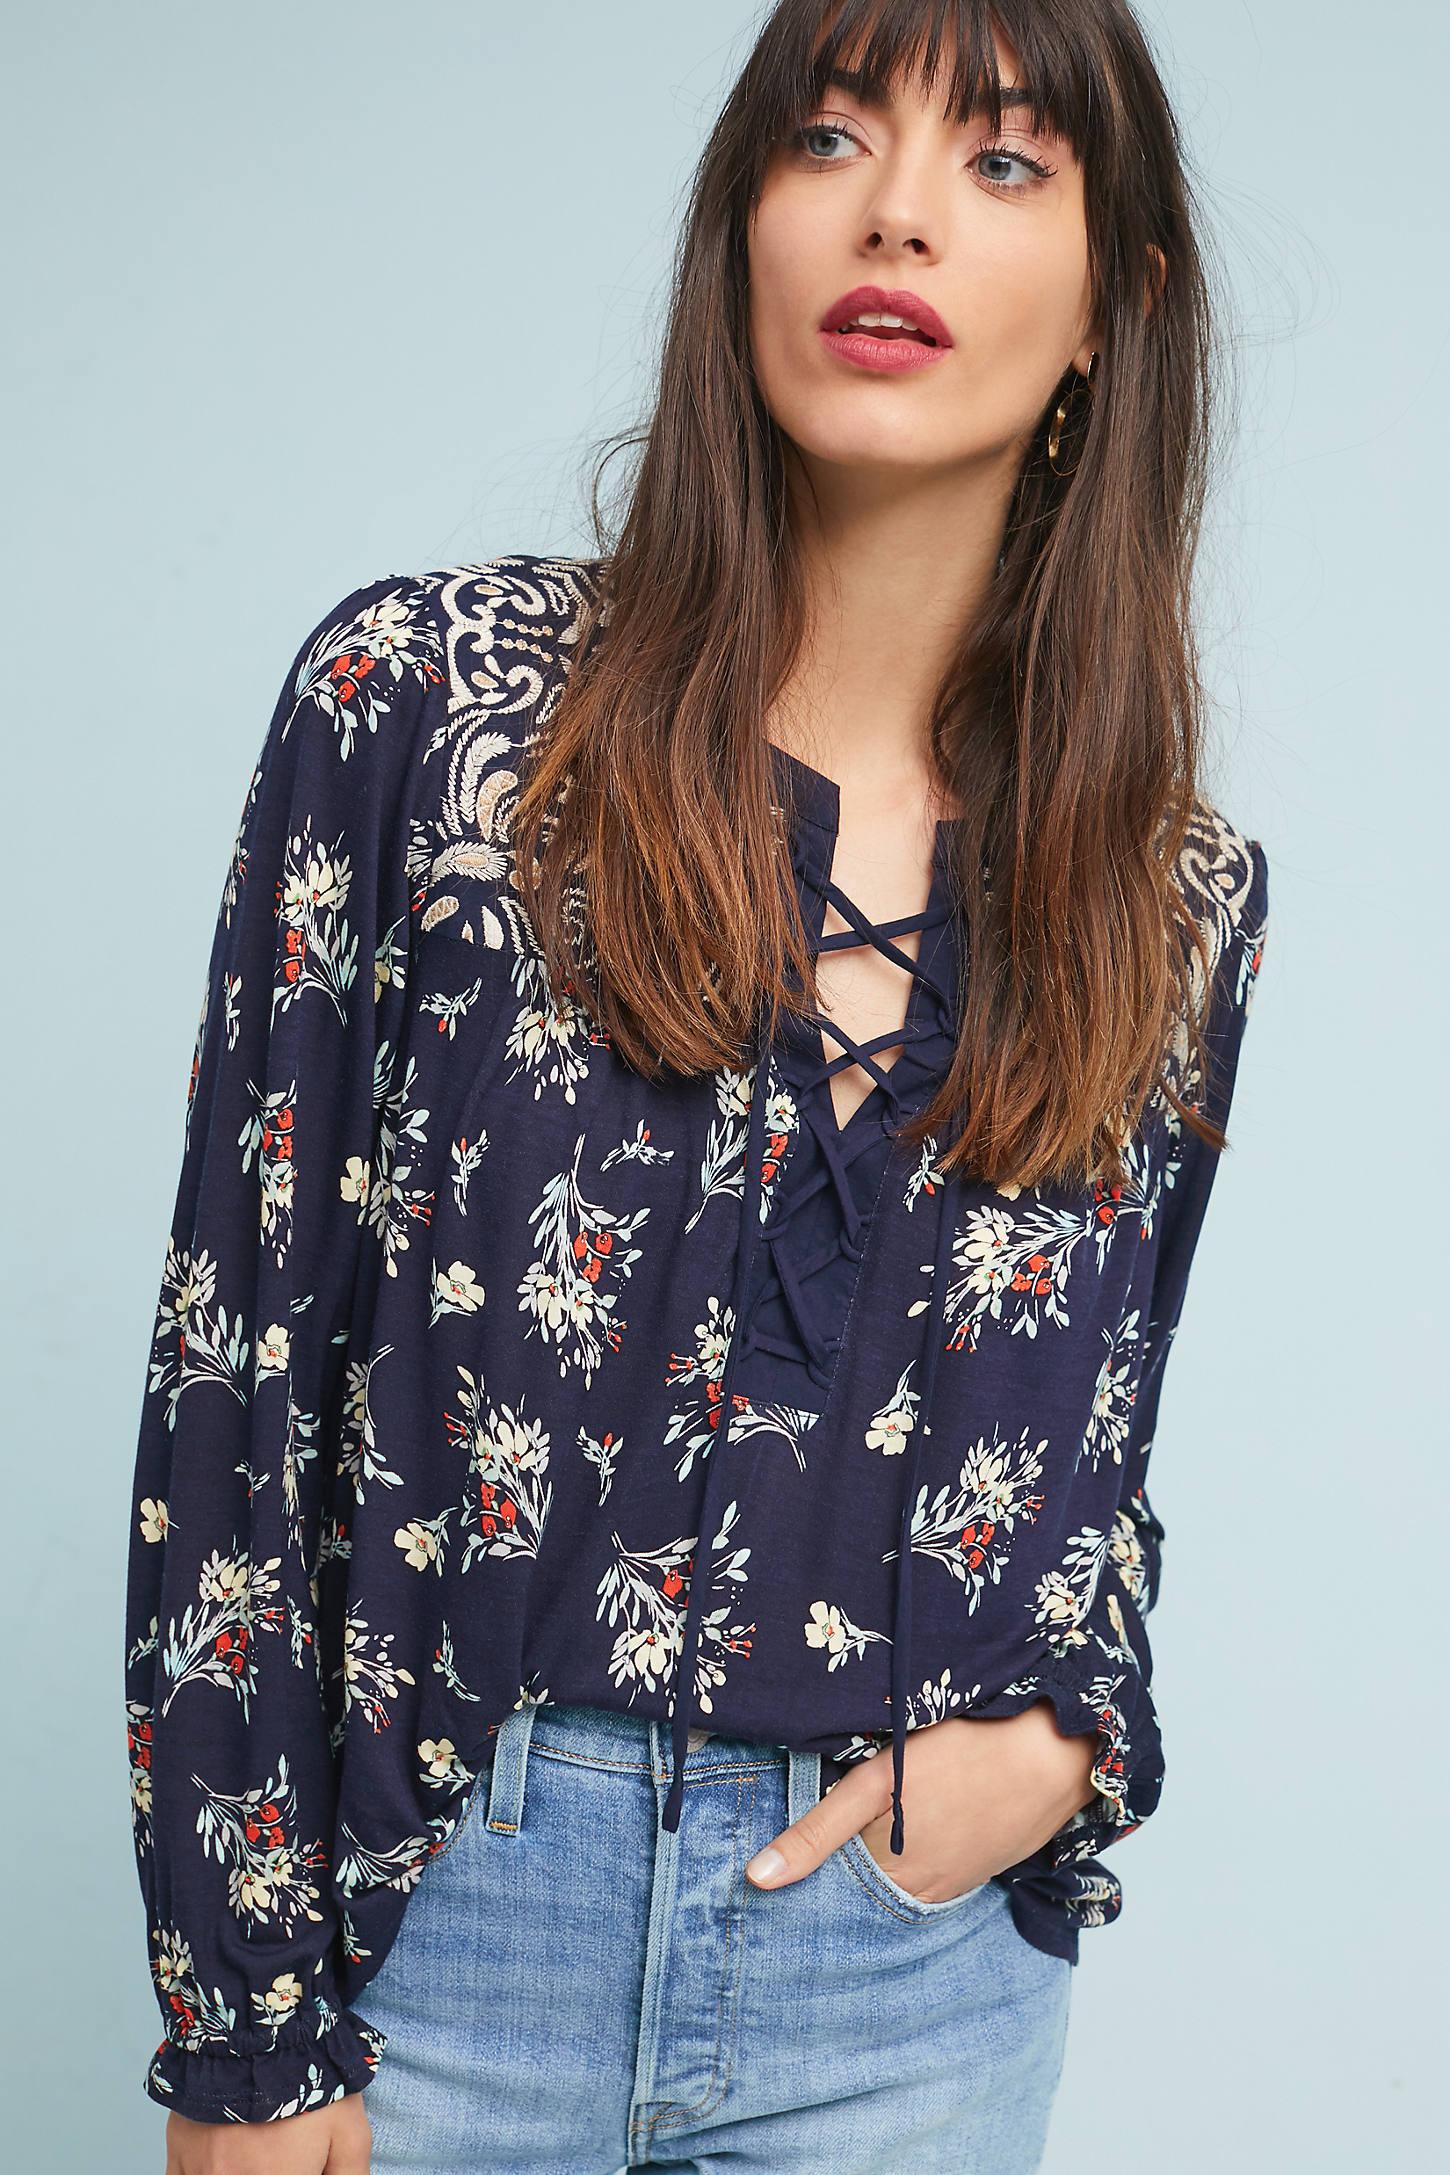 Sydney Floral Top